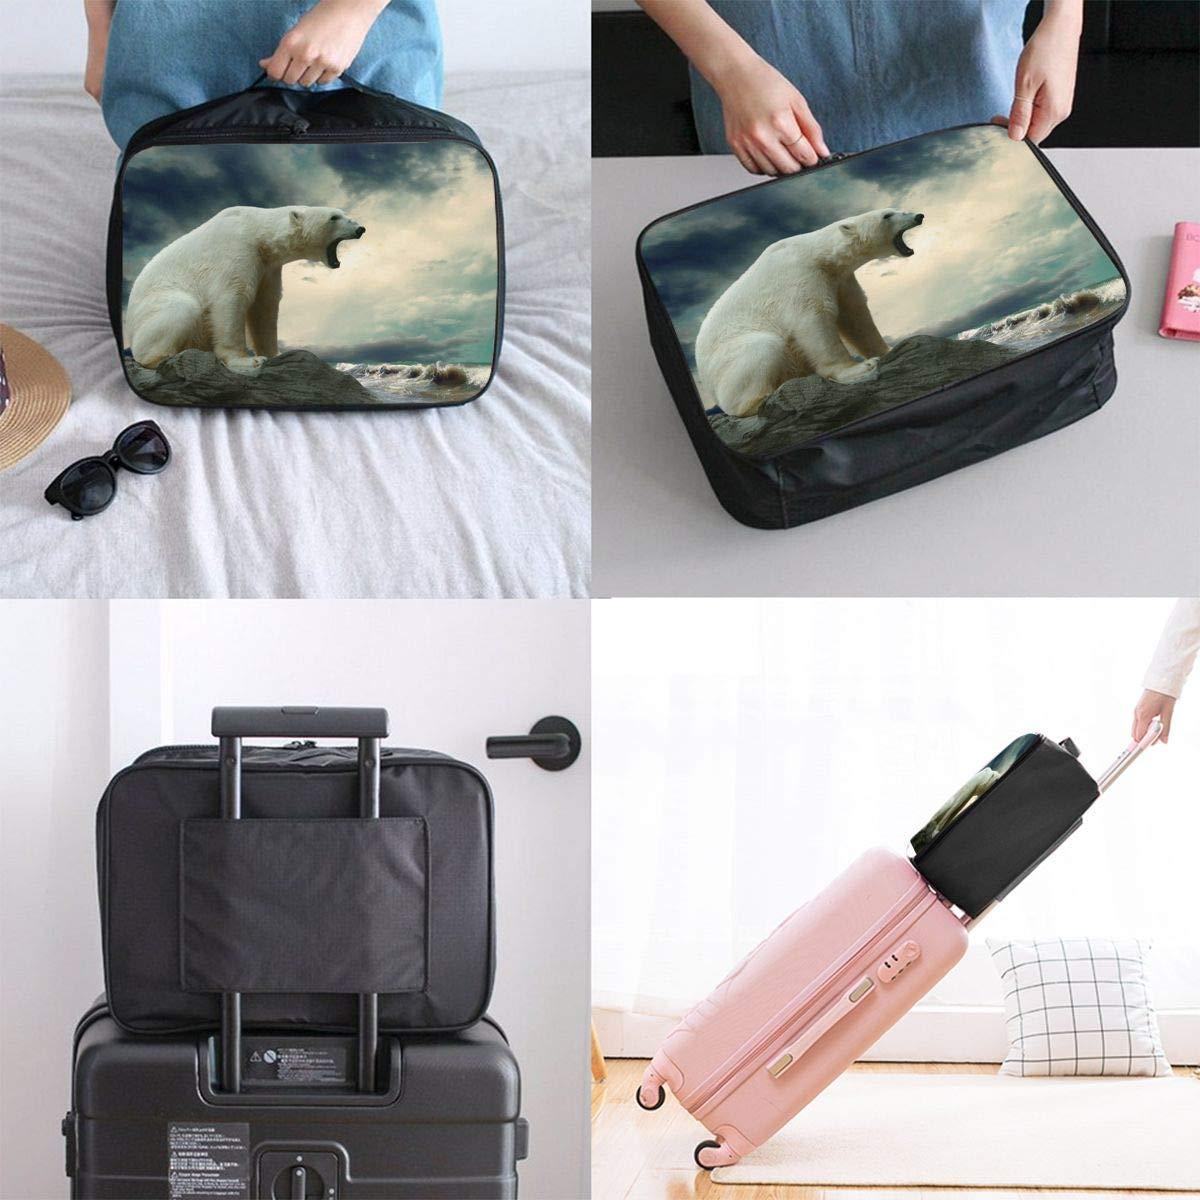 JTRVW Luggage Bags for Travel Lightweight Large Capacity Portable Duffel Bag for Men /& Women Roaring Polar Bear Travel Duffel Bag Backpack